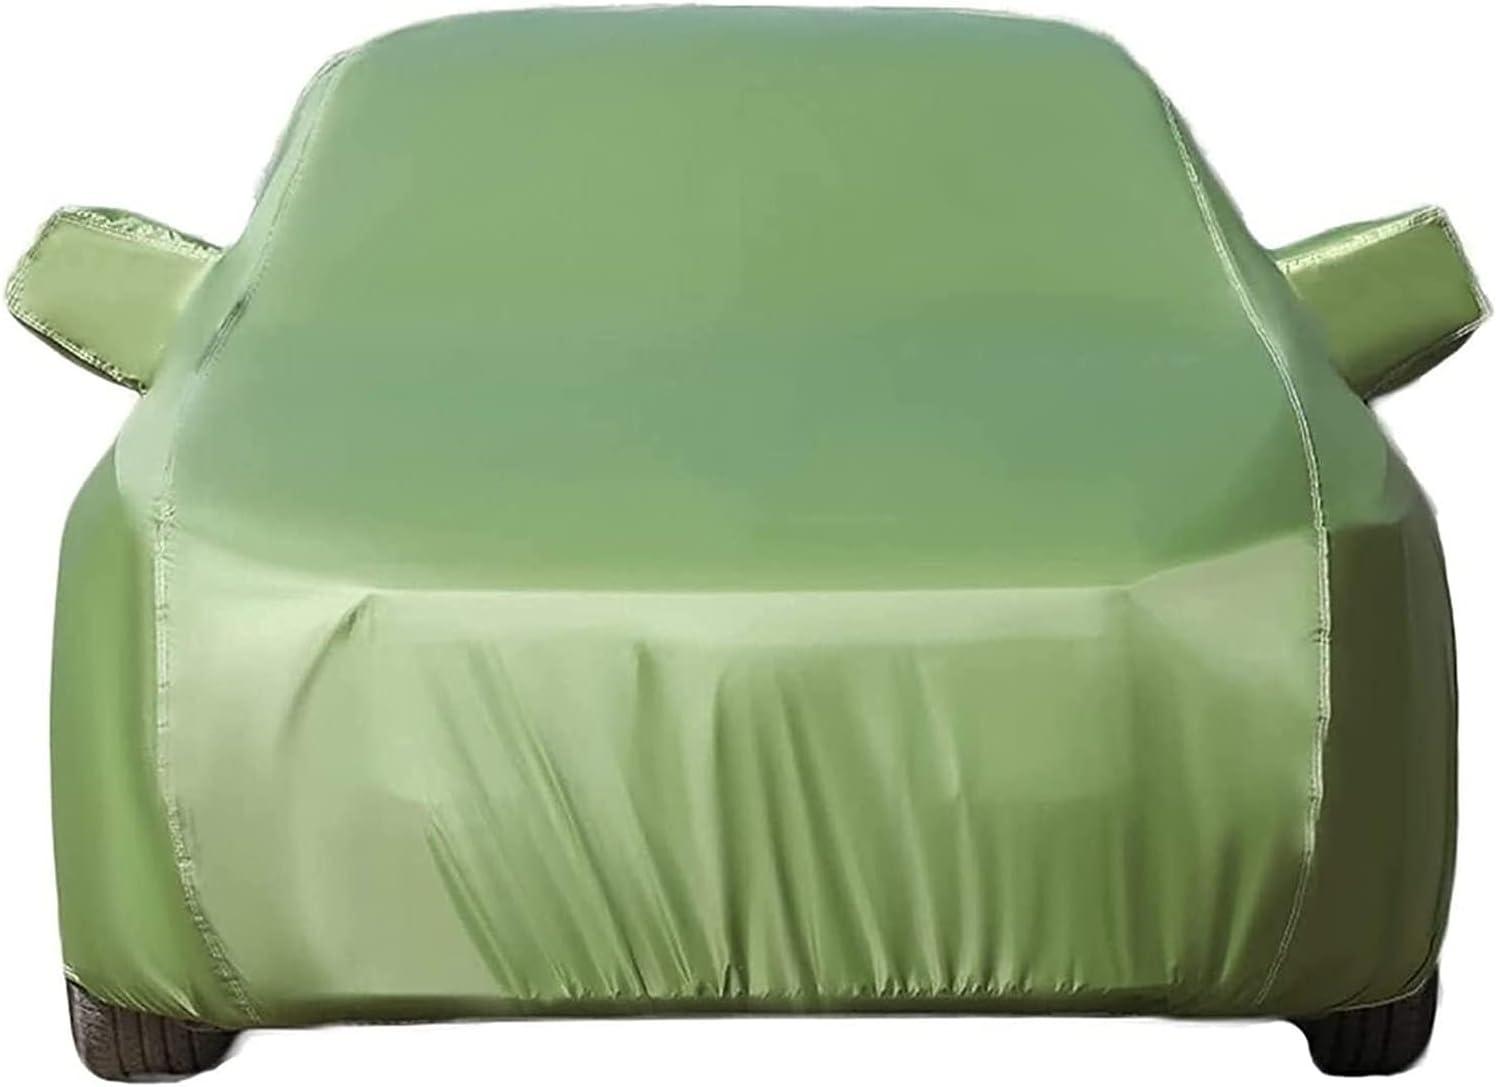 Waterproof Car Cover Compatible with LX570 Import Breathable Cott Lexus Superlatite